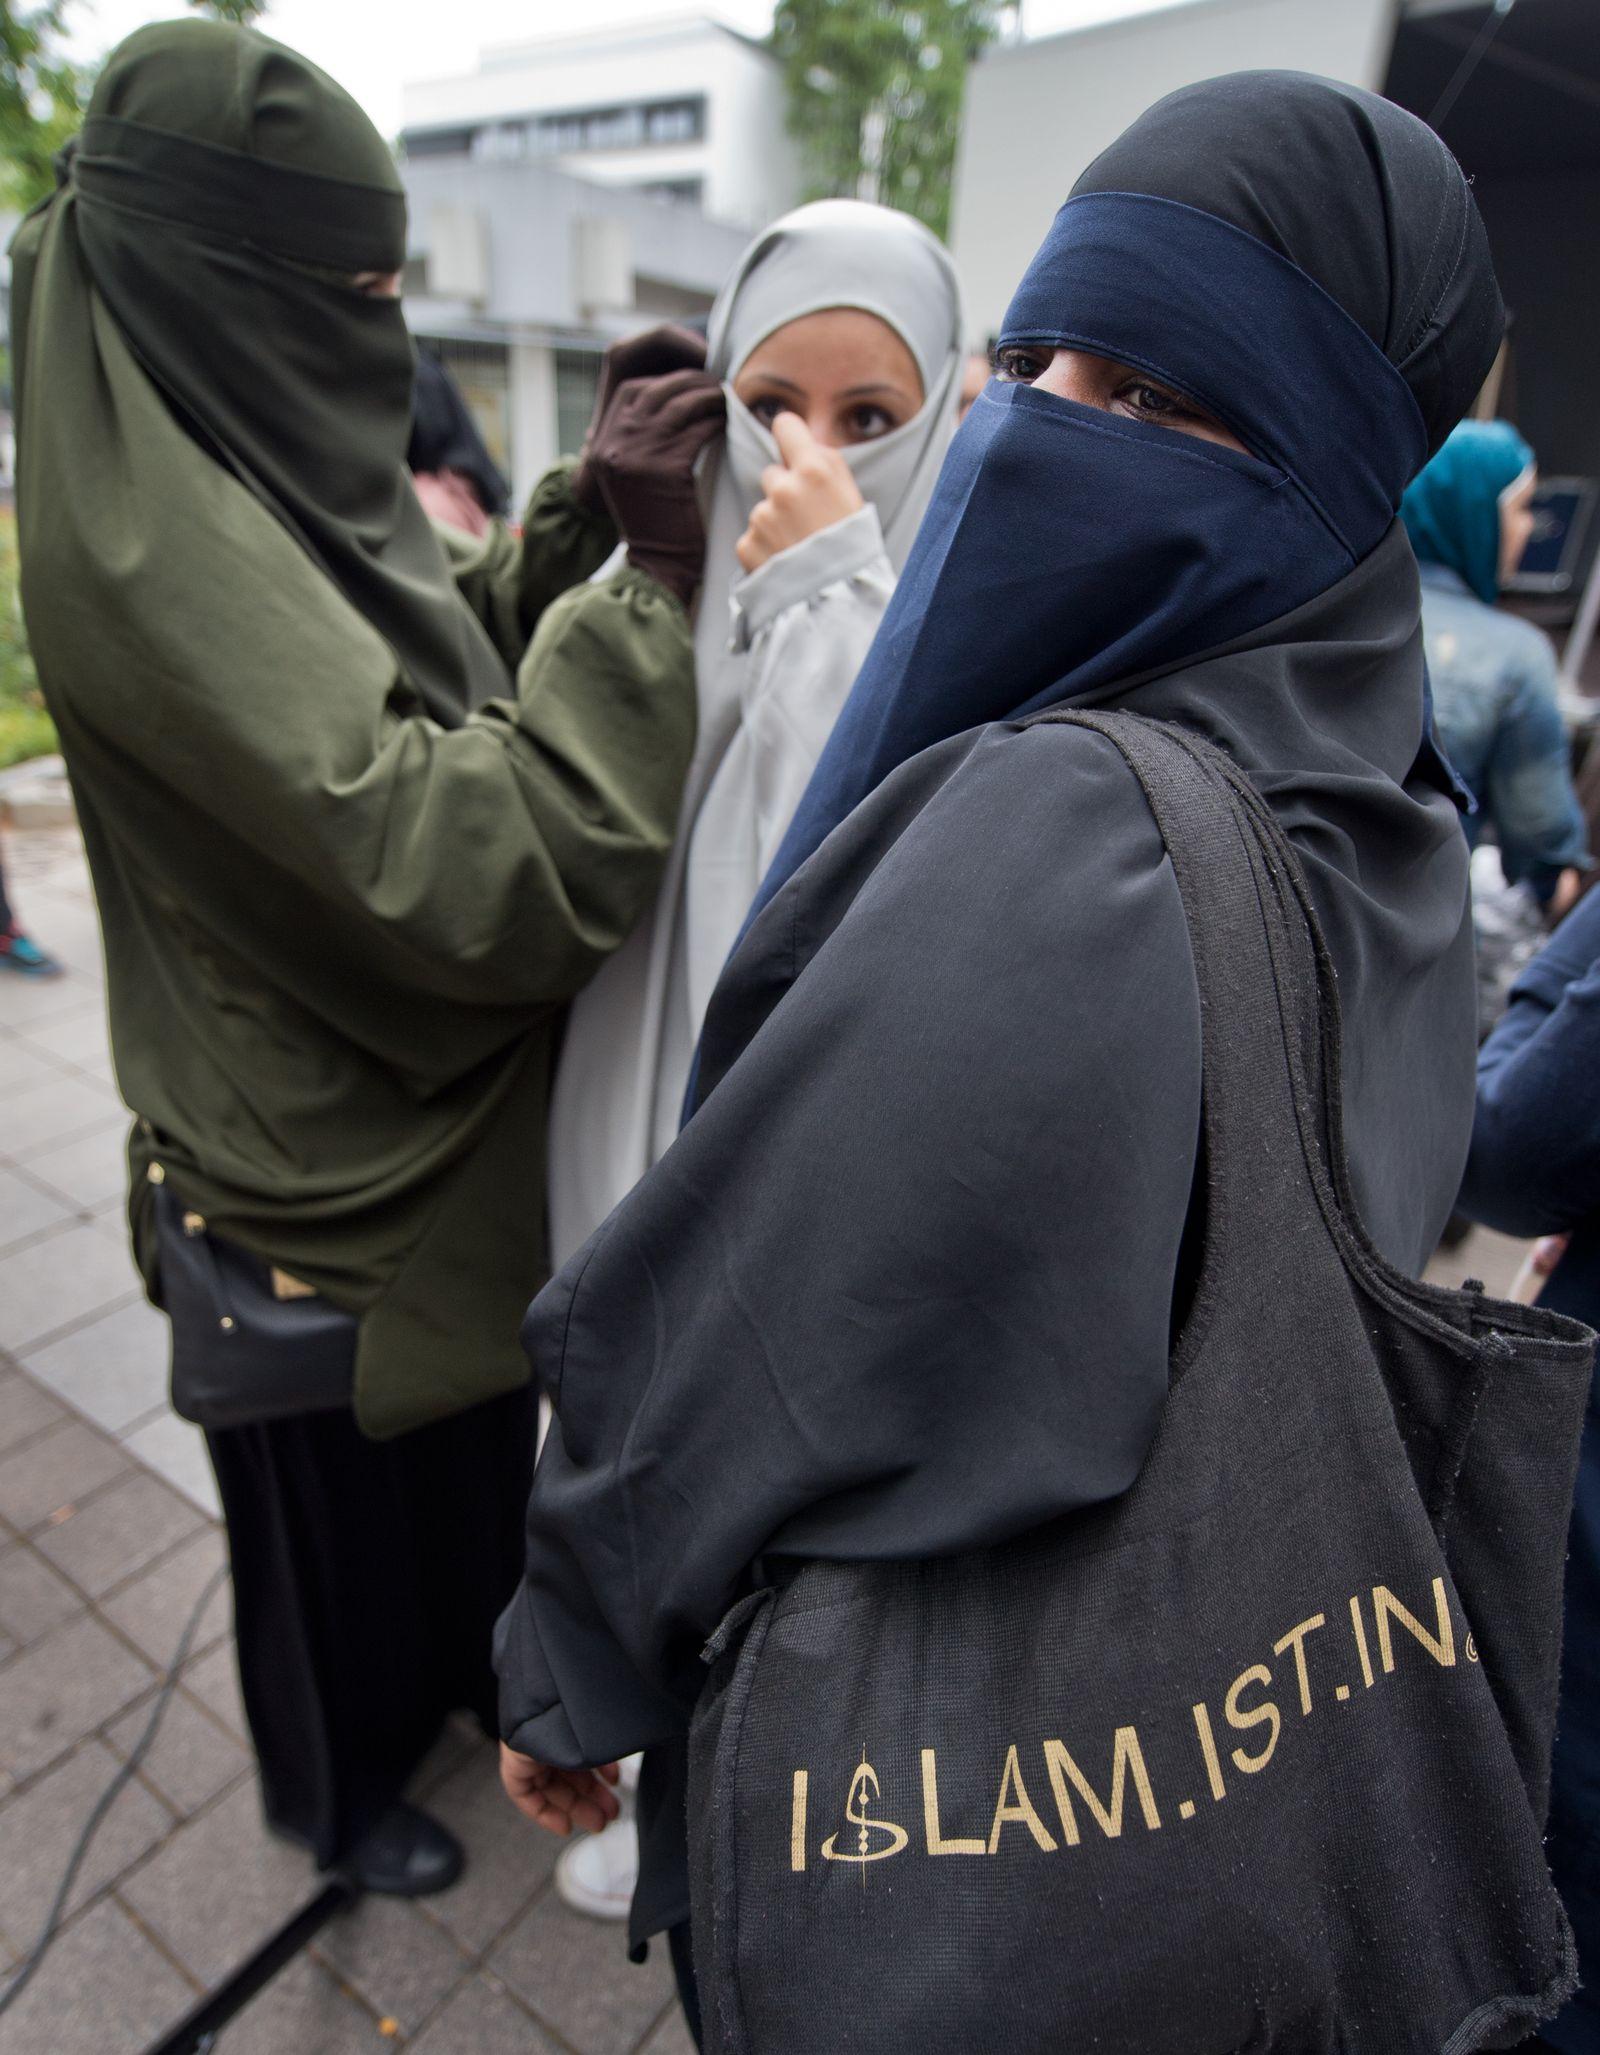 Salafisten-Kundgebung in Offenbach/ Islamistin